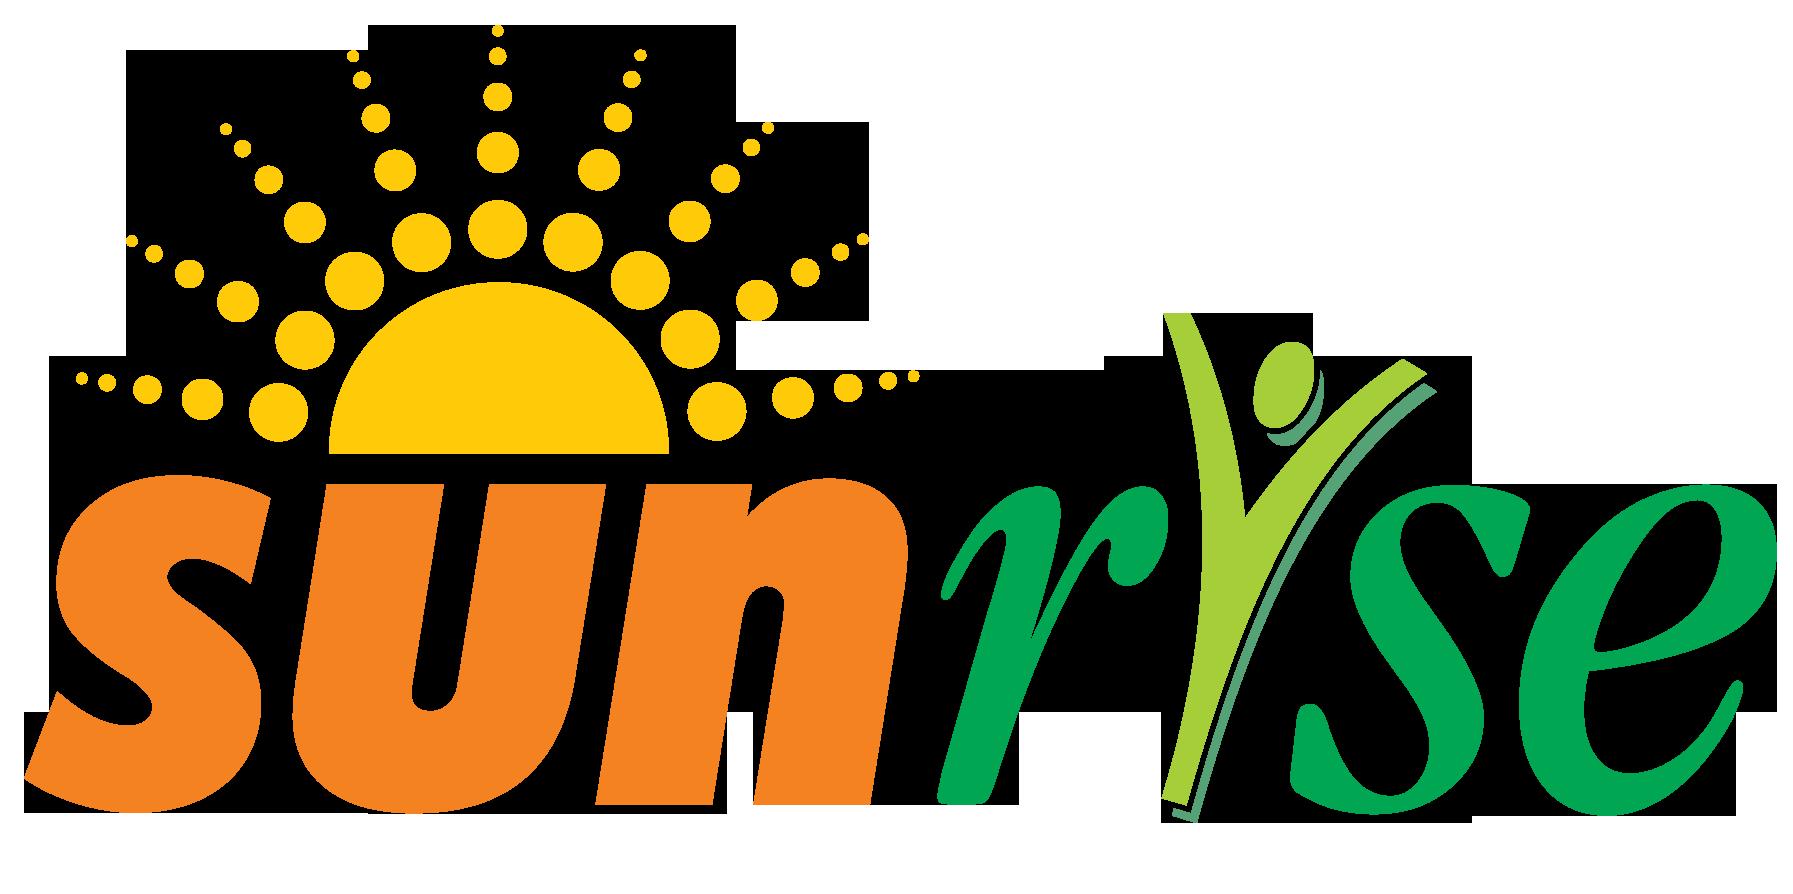 Sun rising clipart png freeuse Pics For > Sunrise Logo Png | SHINE | Pinterest | Logos freeuse